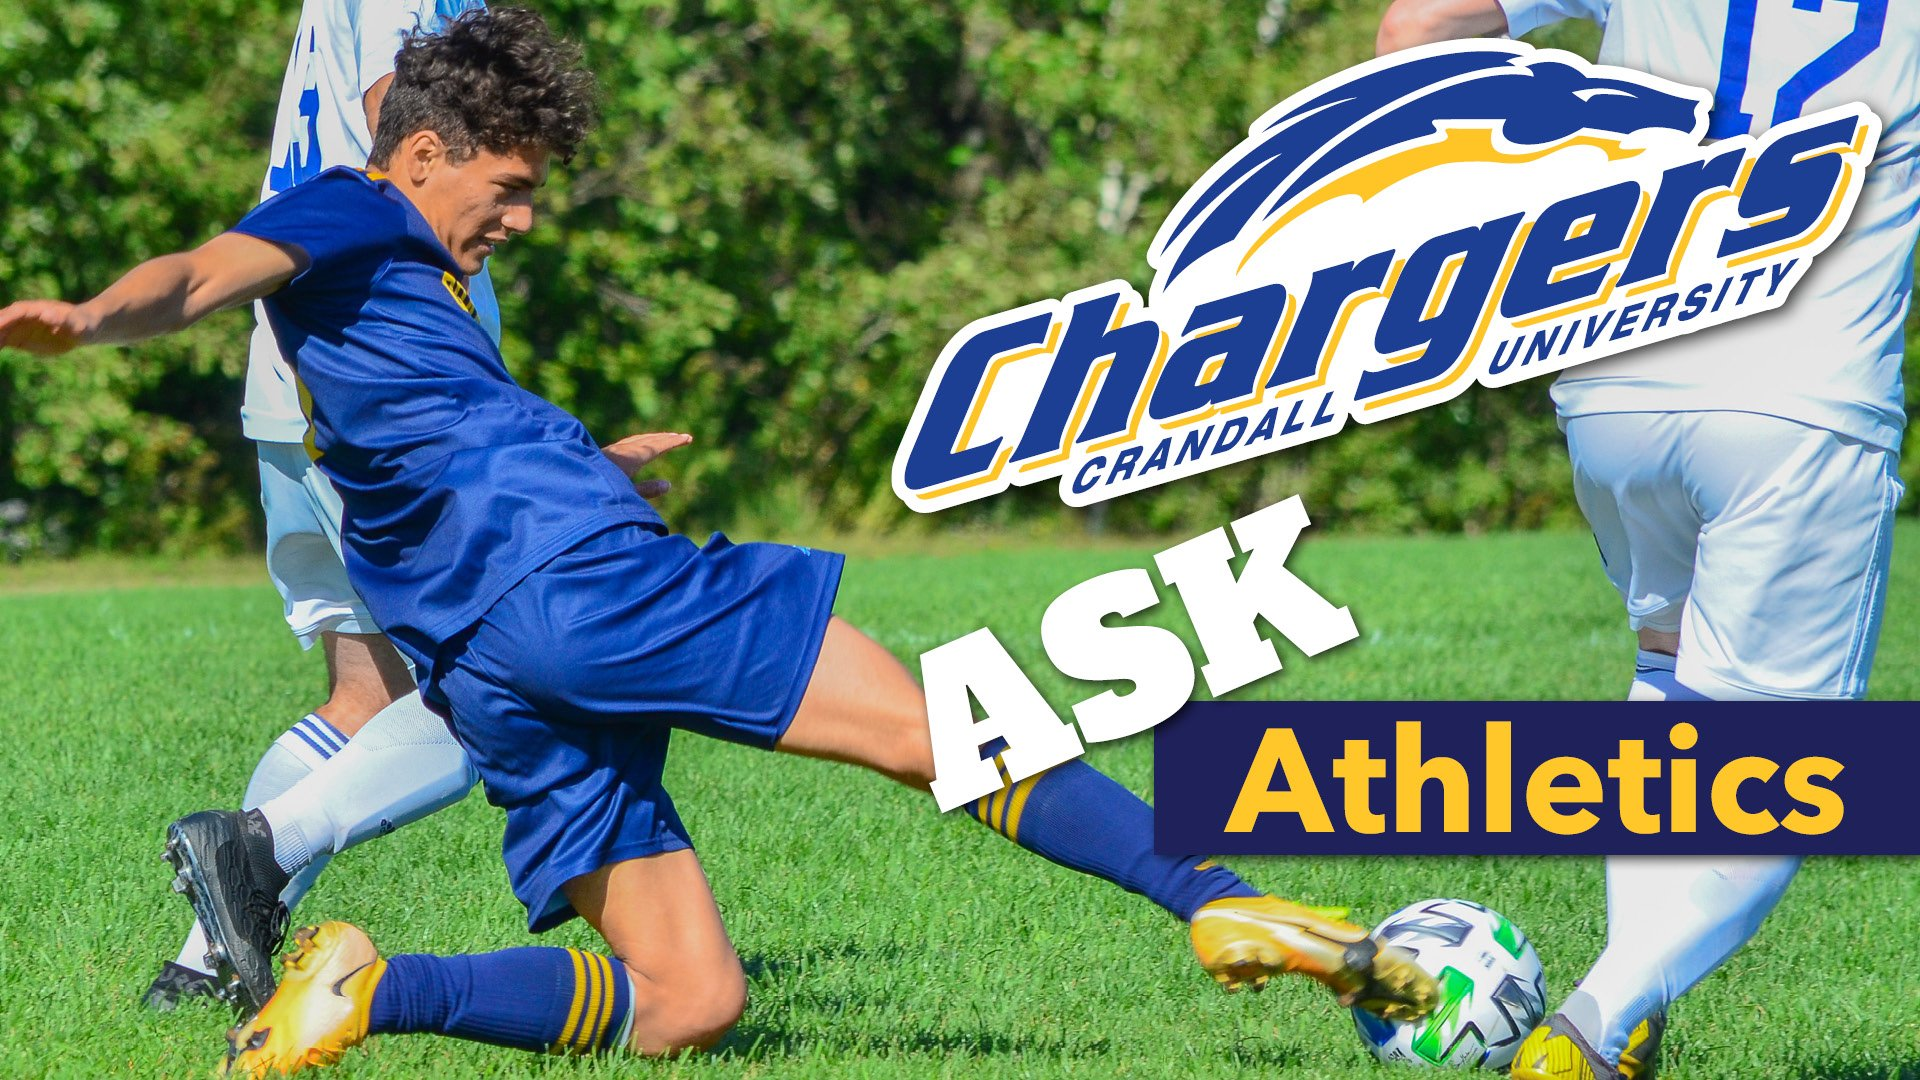 Ask Athletics